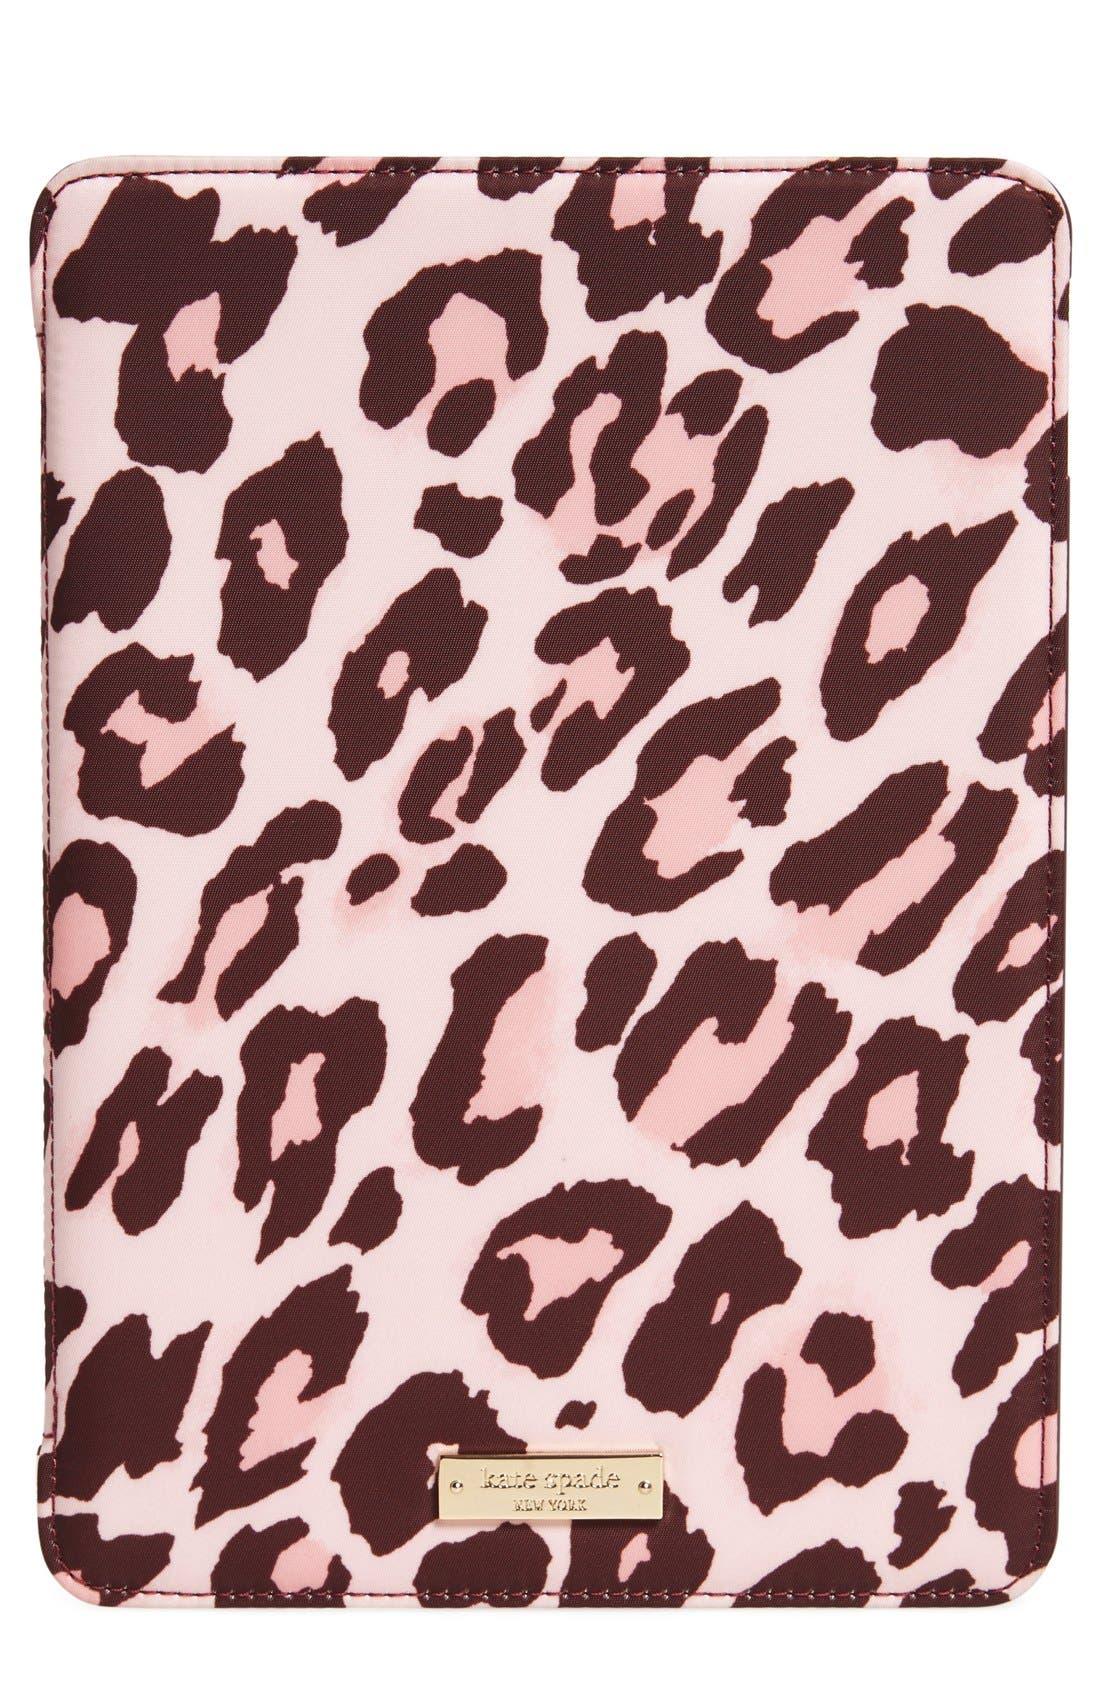 KATE SPADE NEW YORK,                             leopard print iPad Air 2 hardcase folio,                             Main thumbnail 1, color,                             650